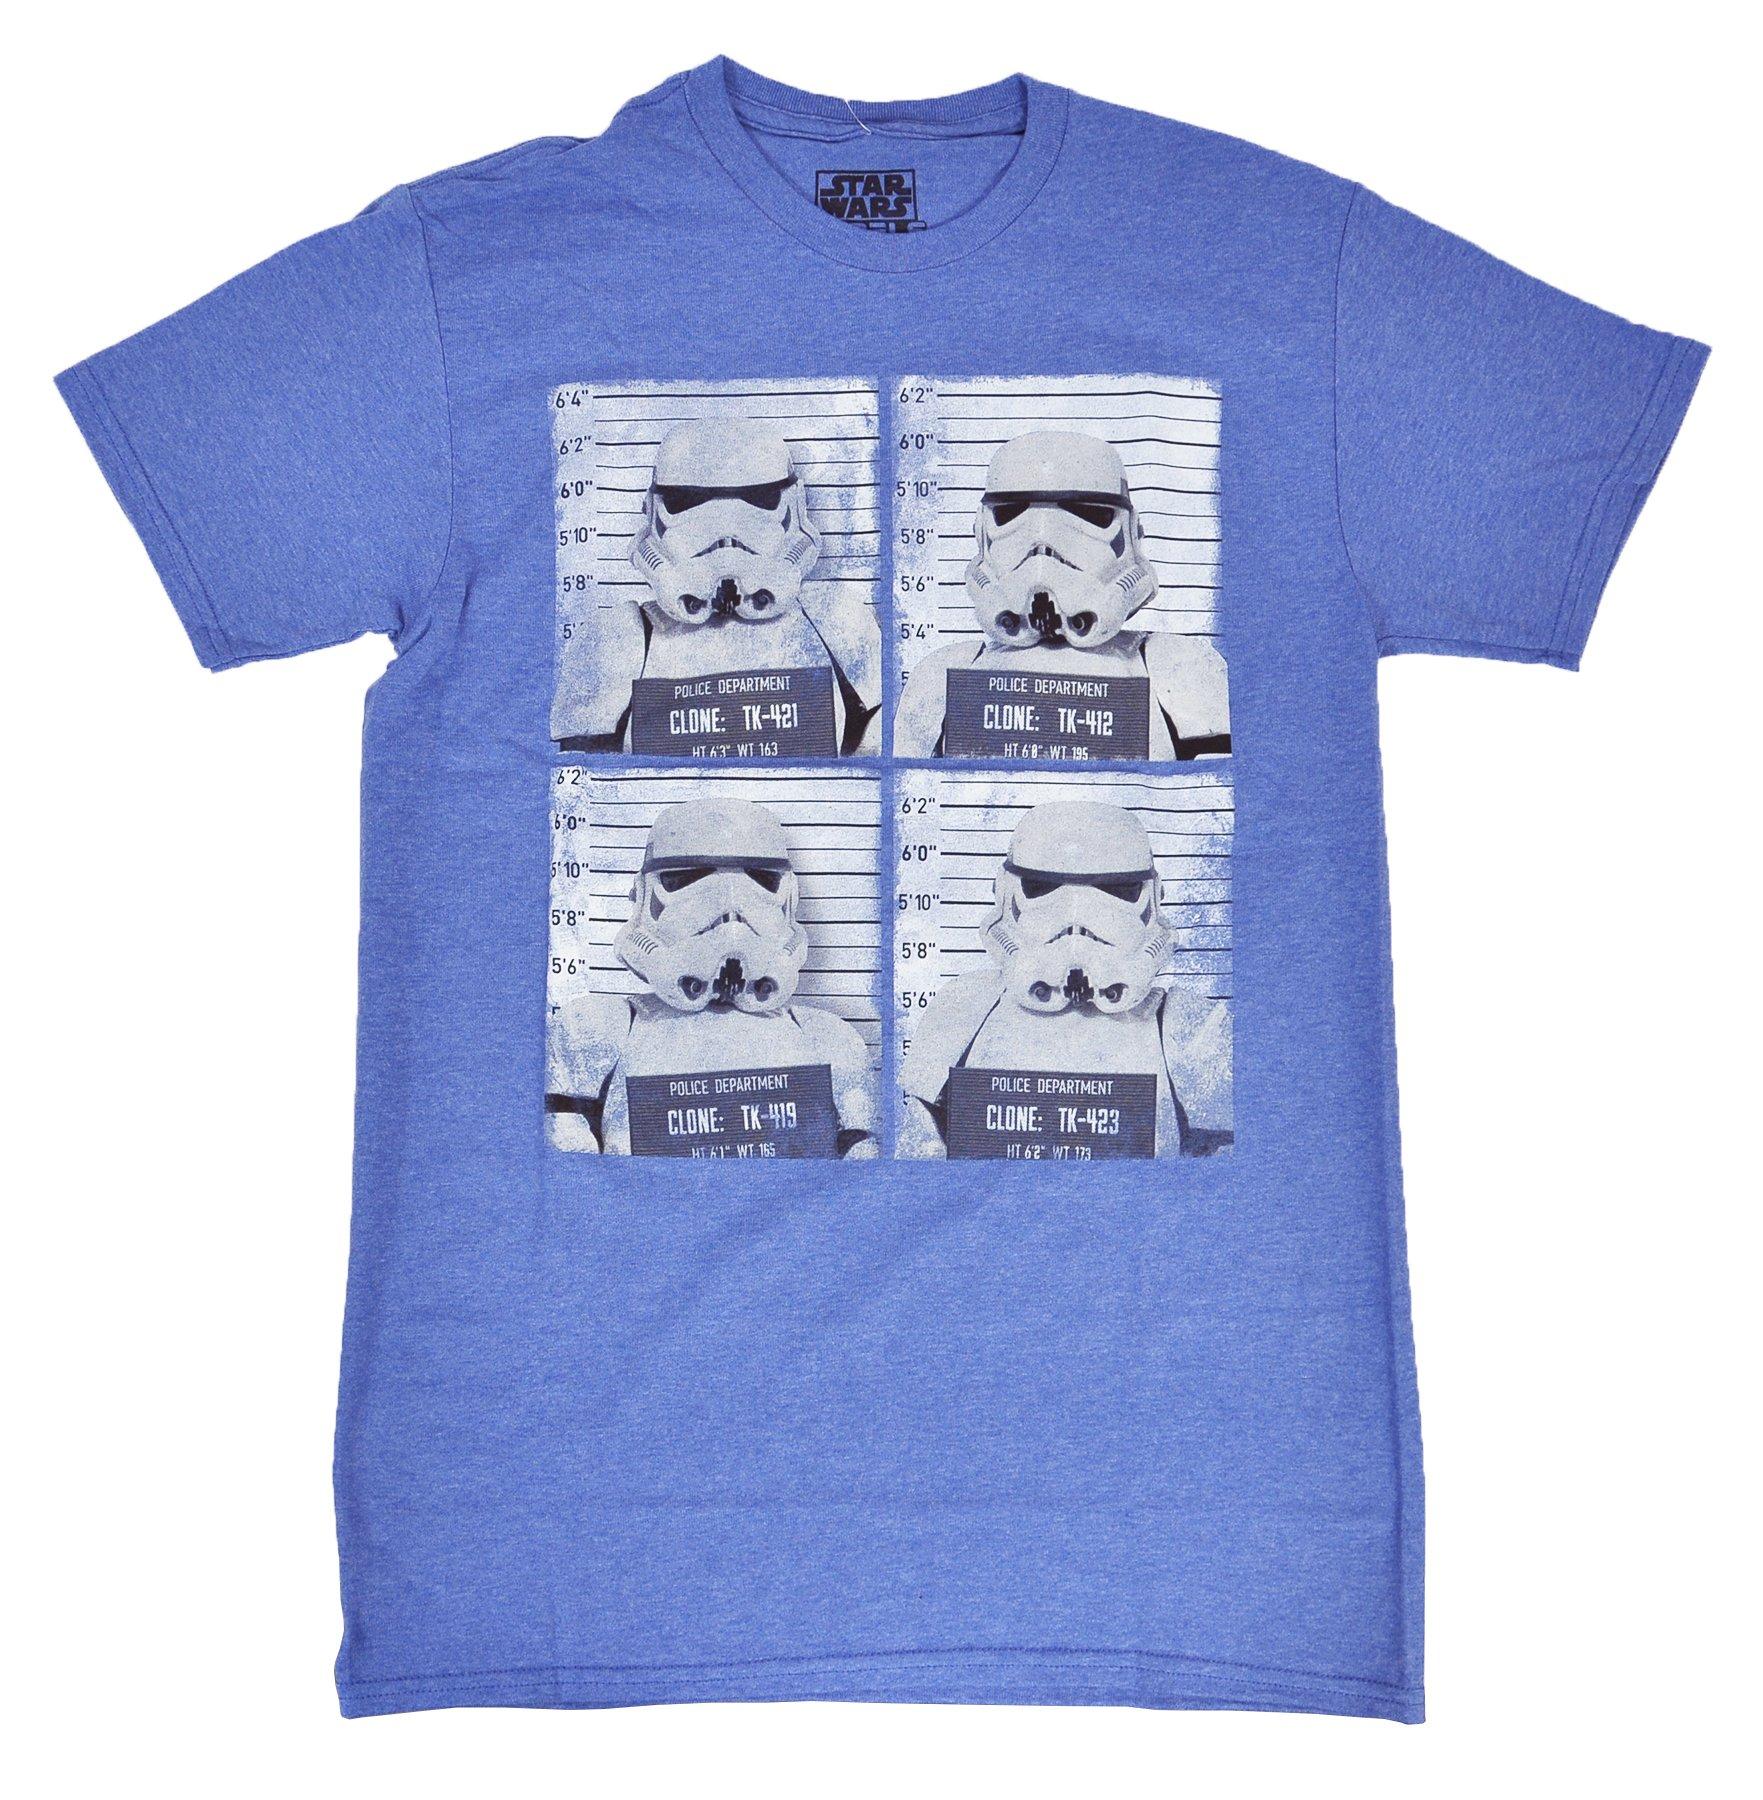 Discount Disney World T Shirts Bcd Tofu House